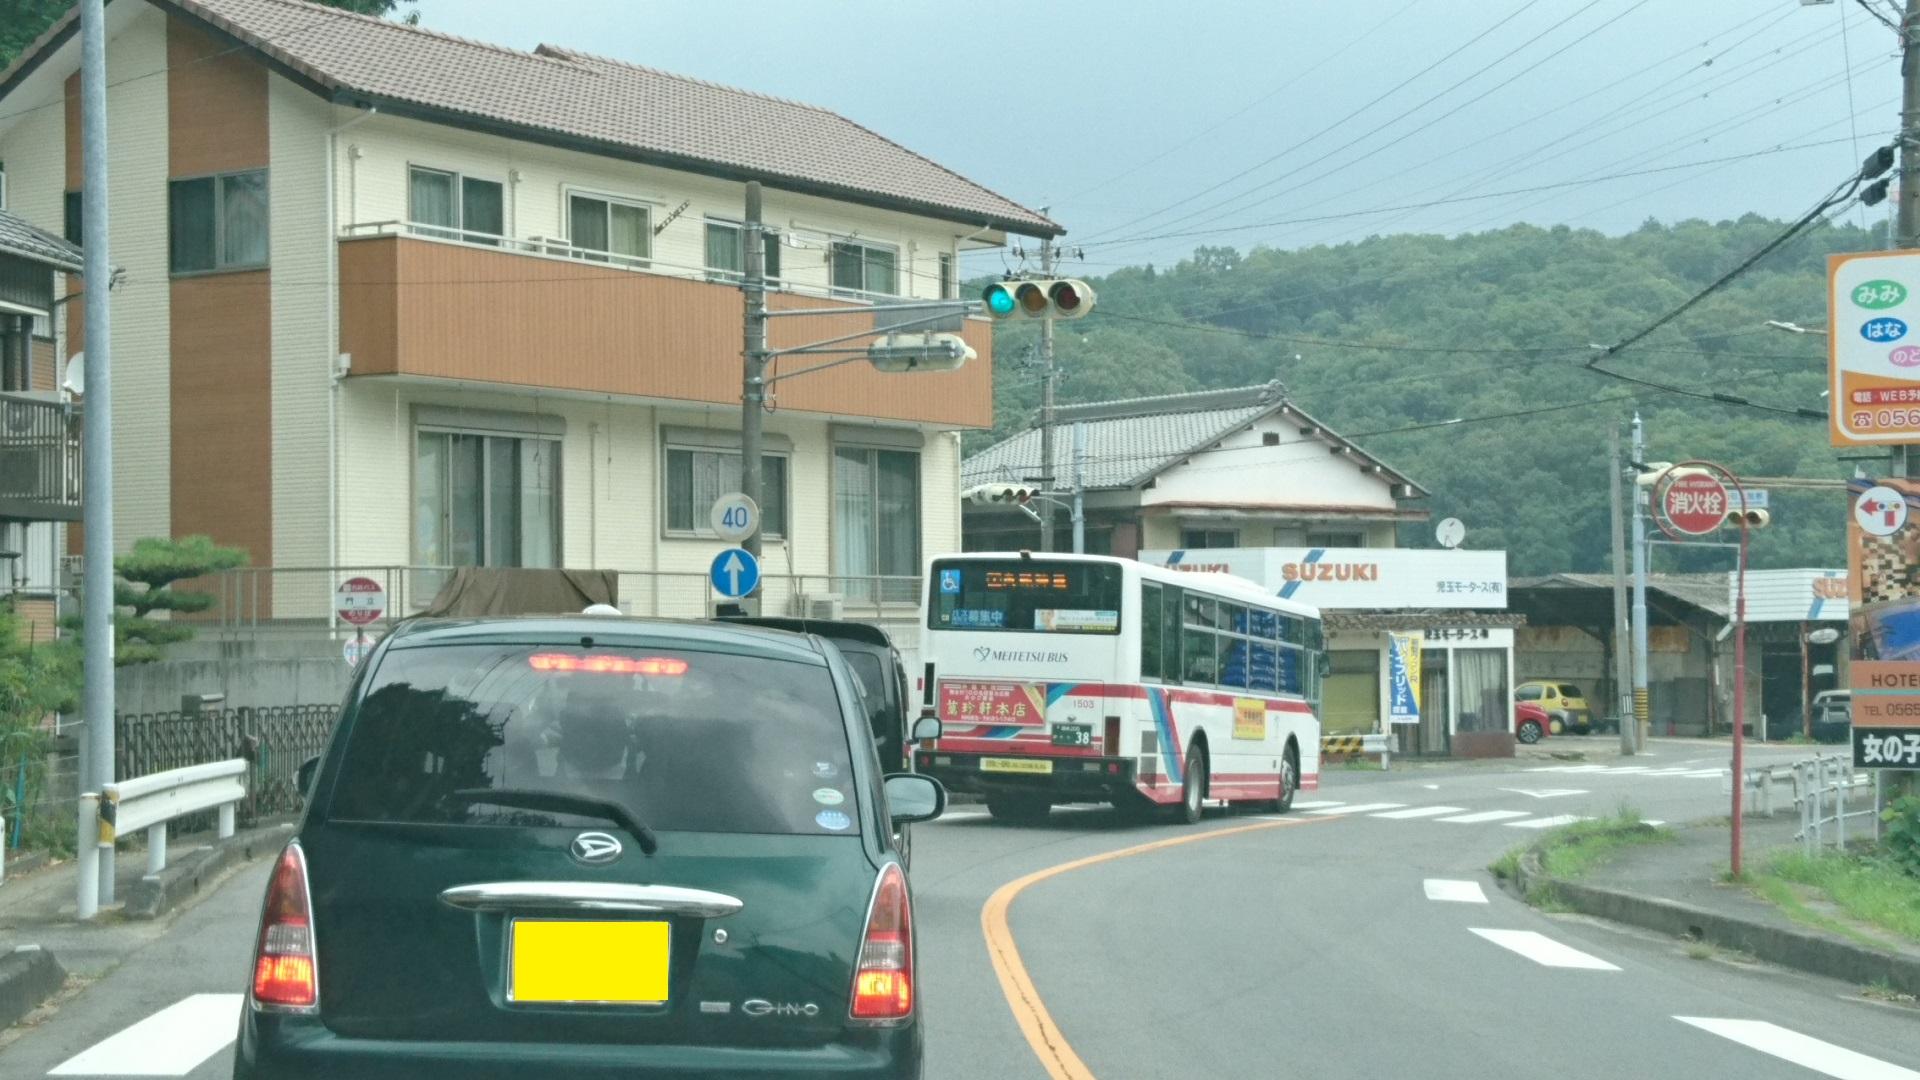 2017.8.11 門立 (7) 門立 - バス停(順) 1920-1080